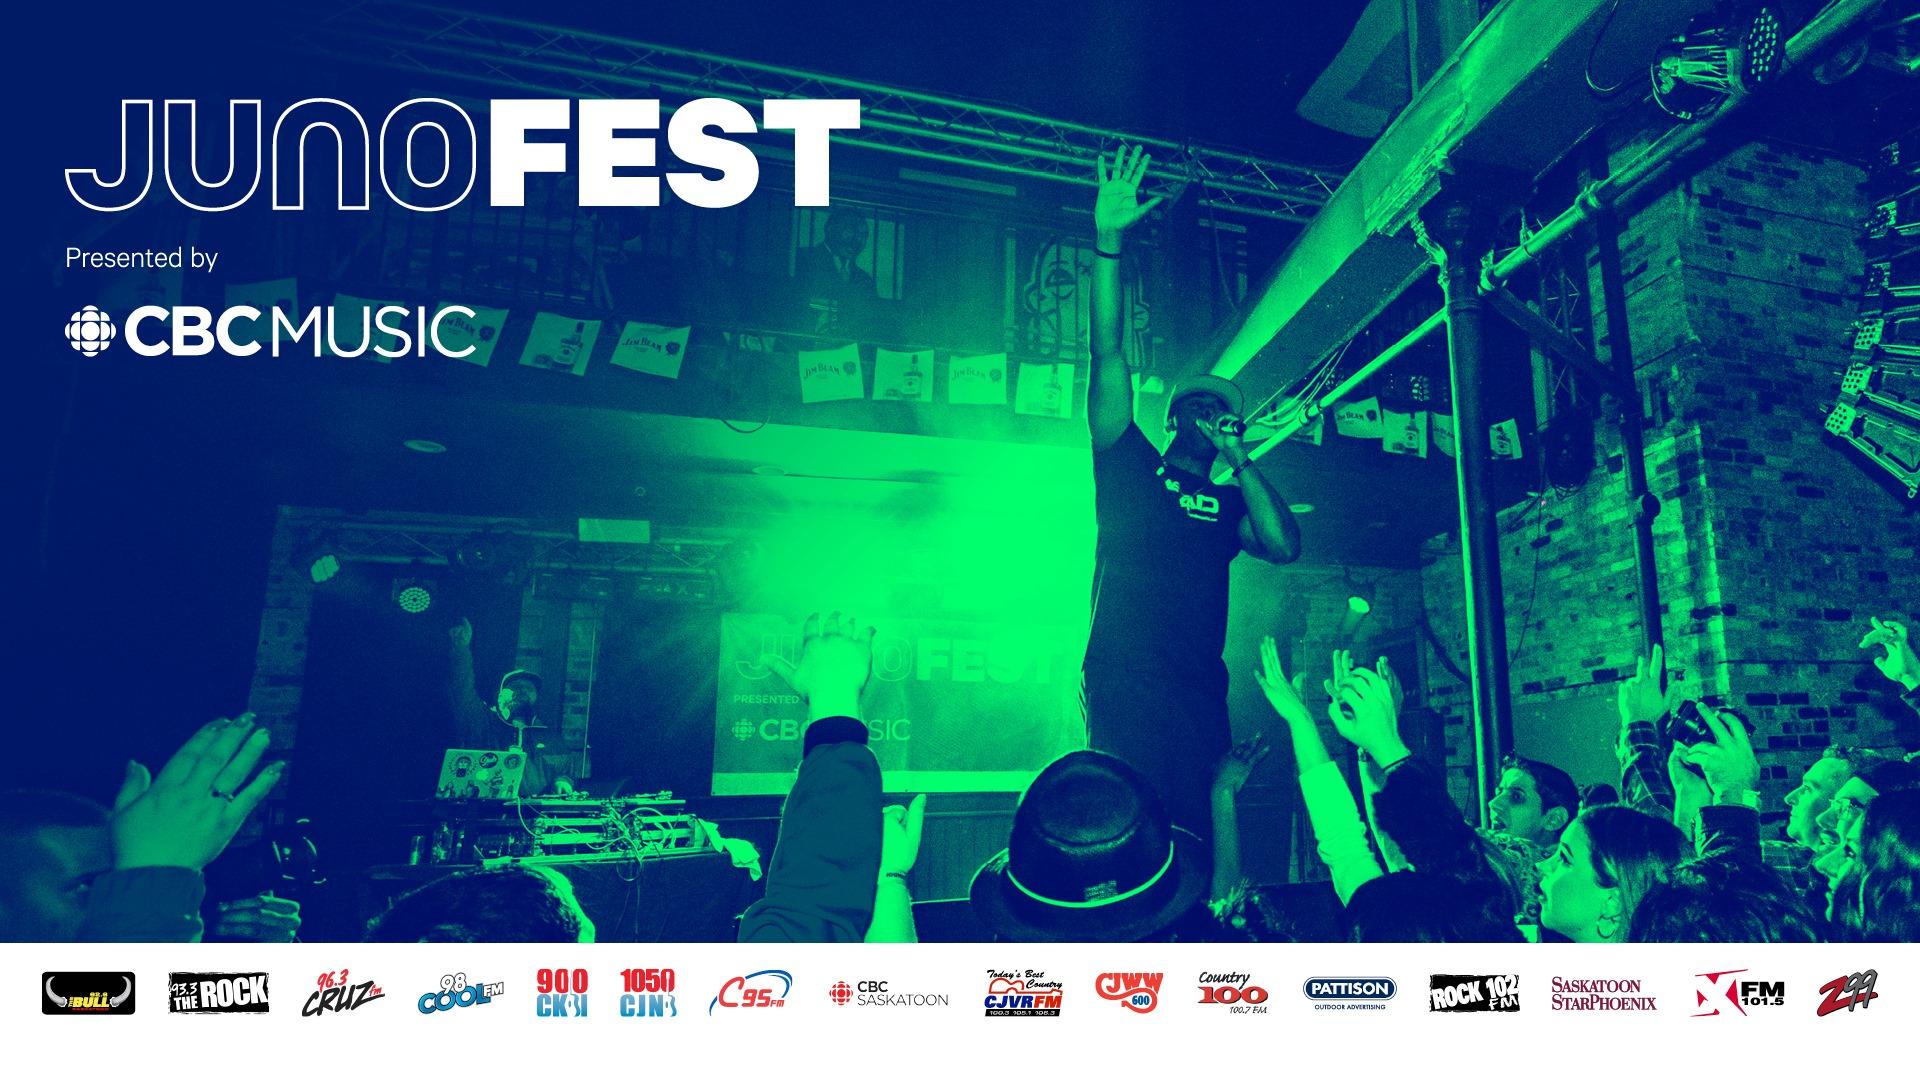 What to do in Saskatoon: JUNOfest edition